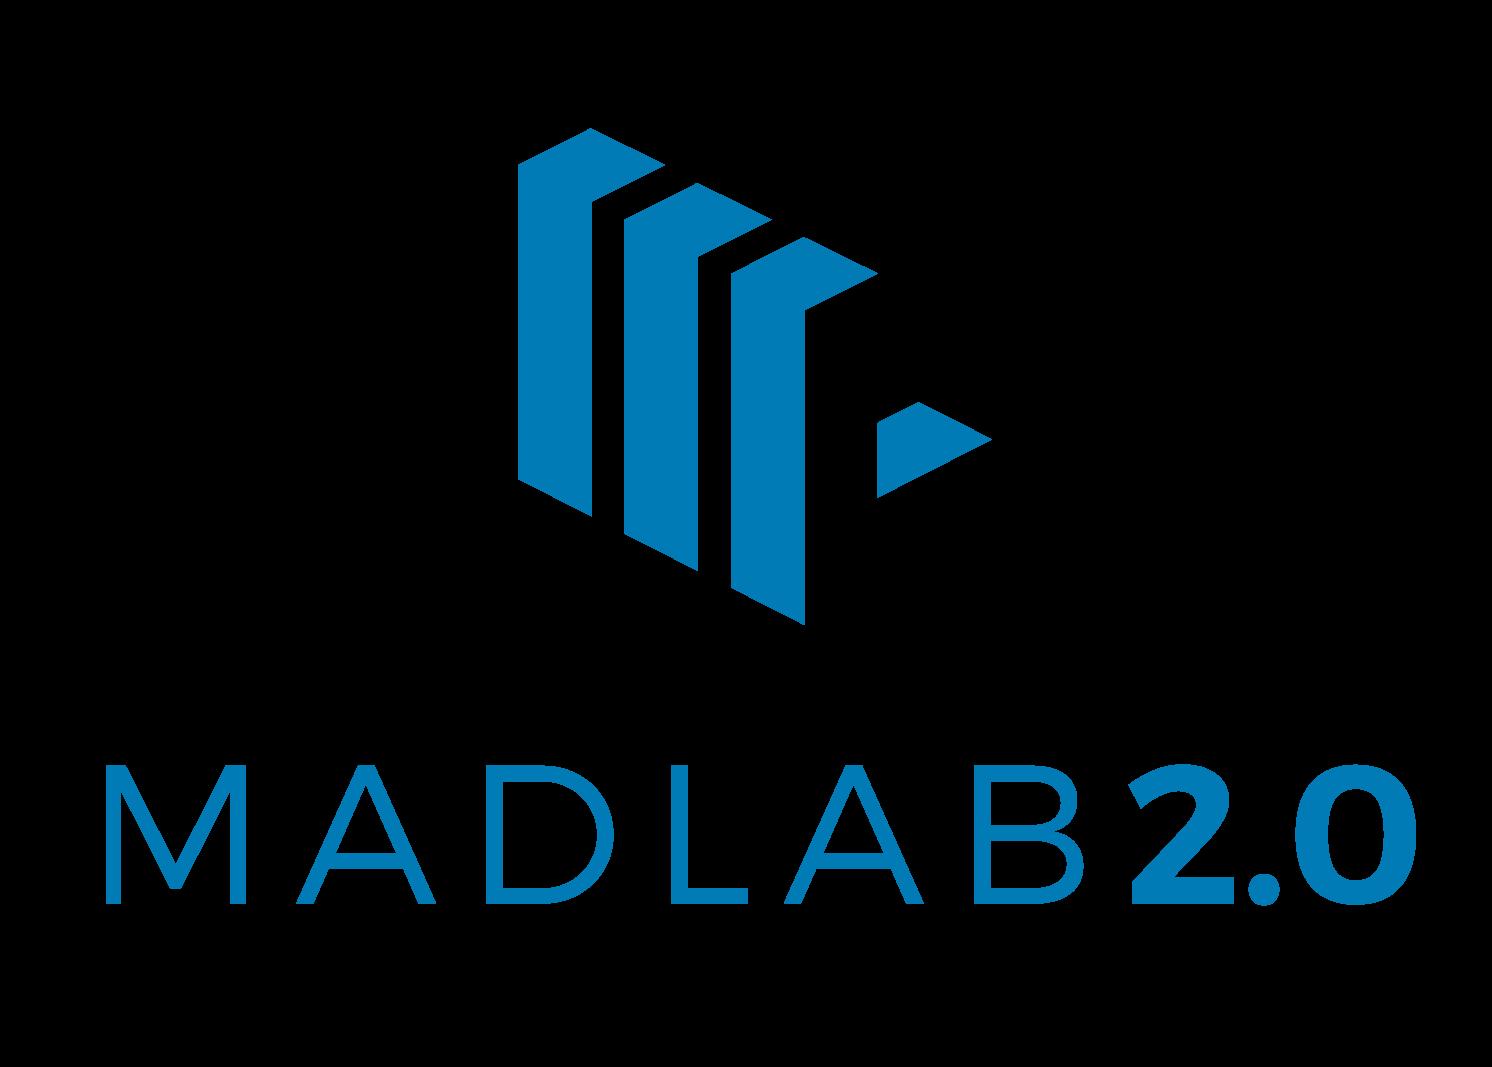 MadLab 2.0